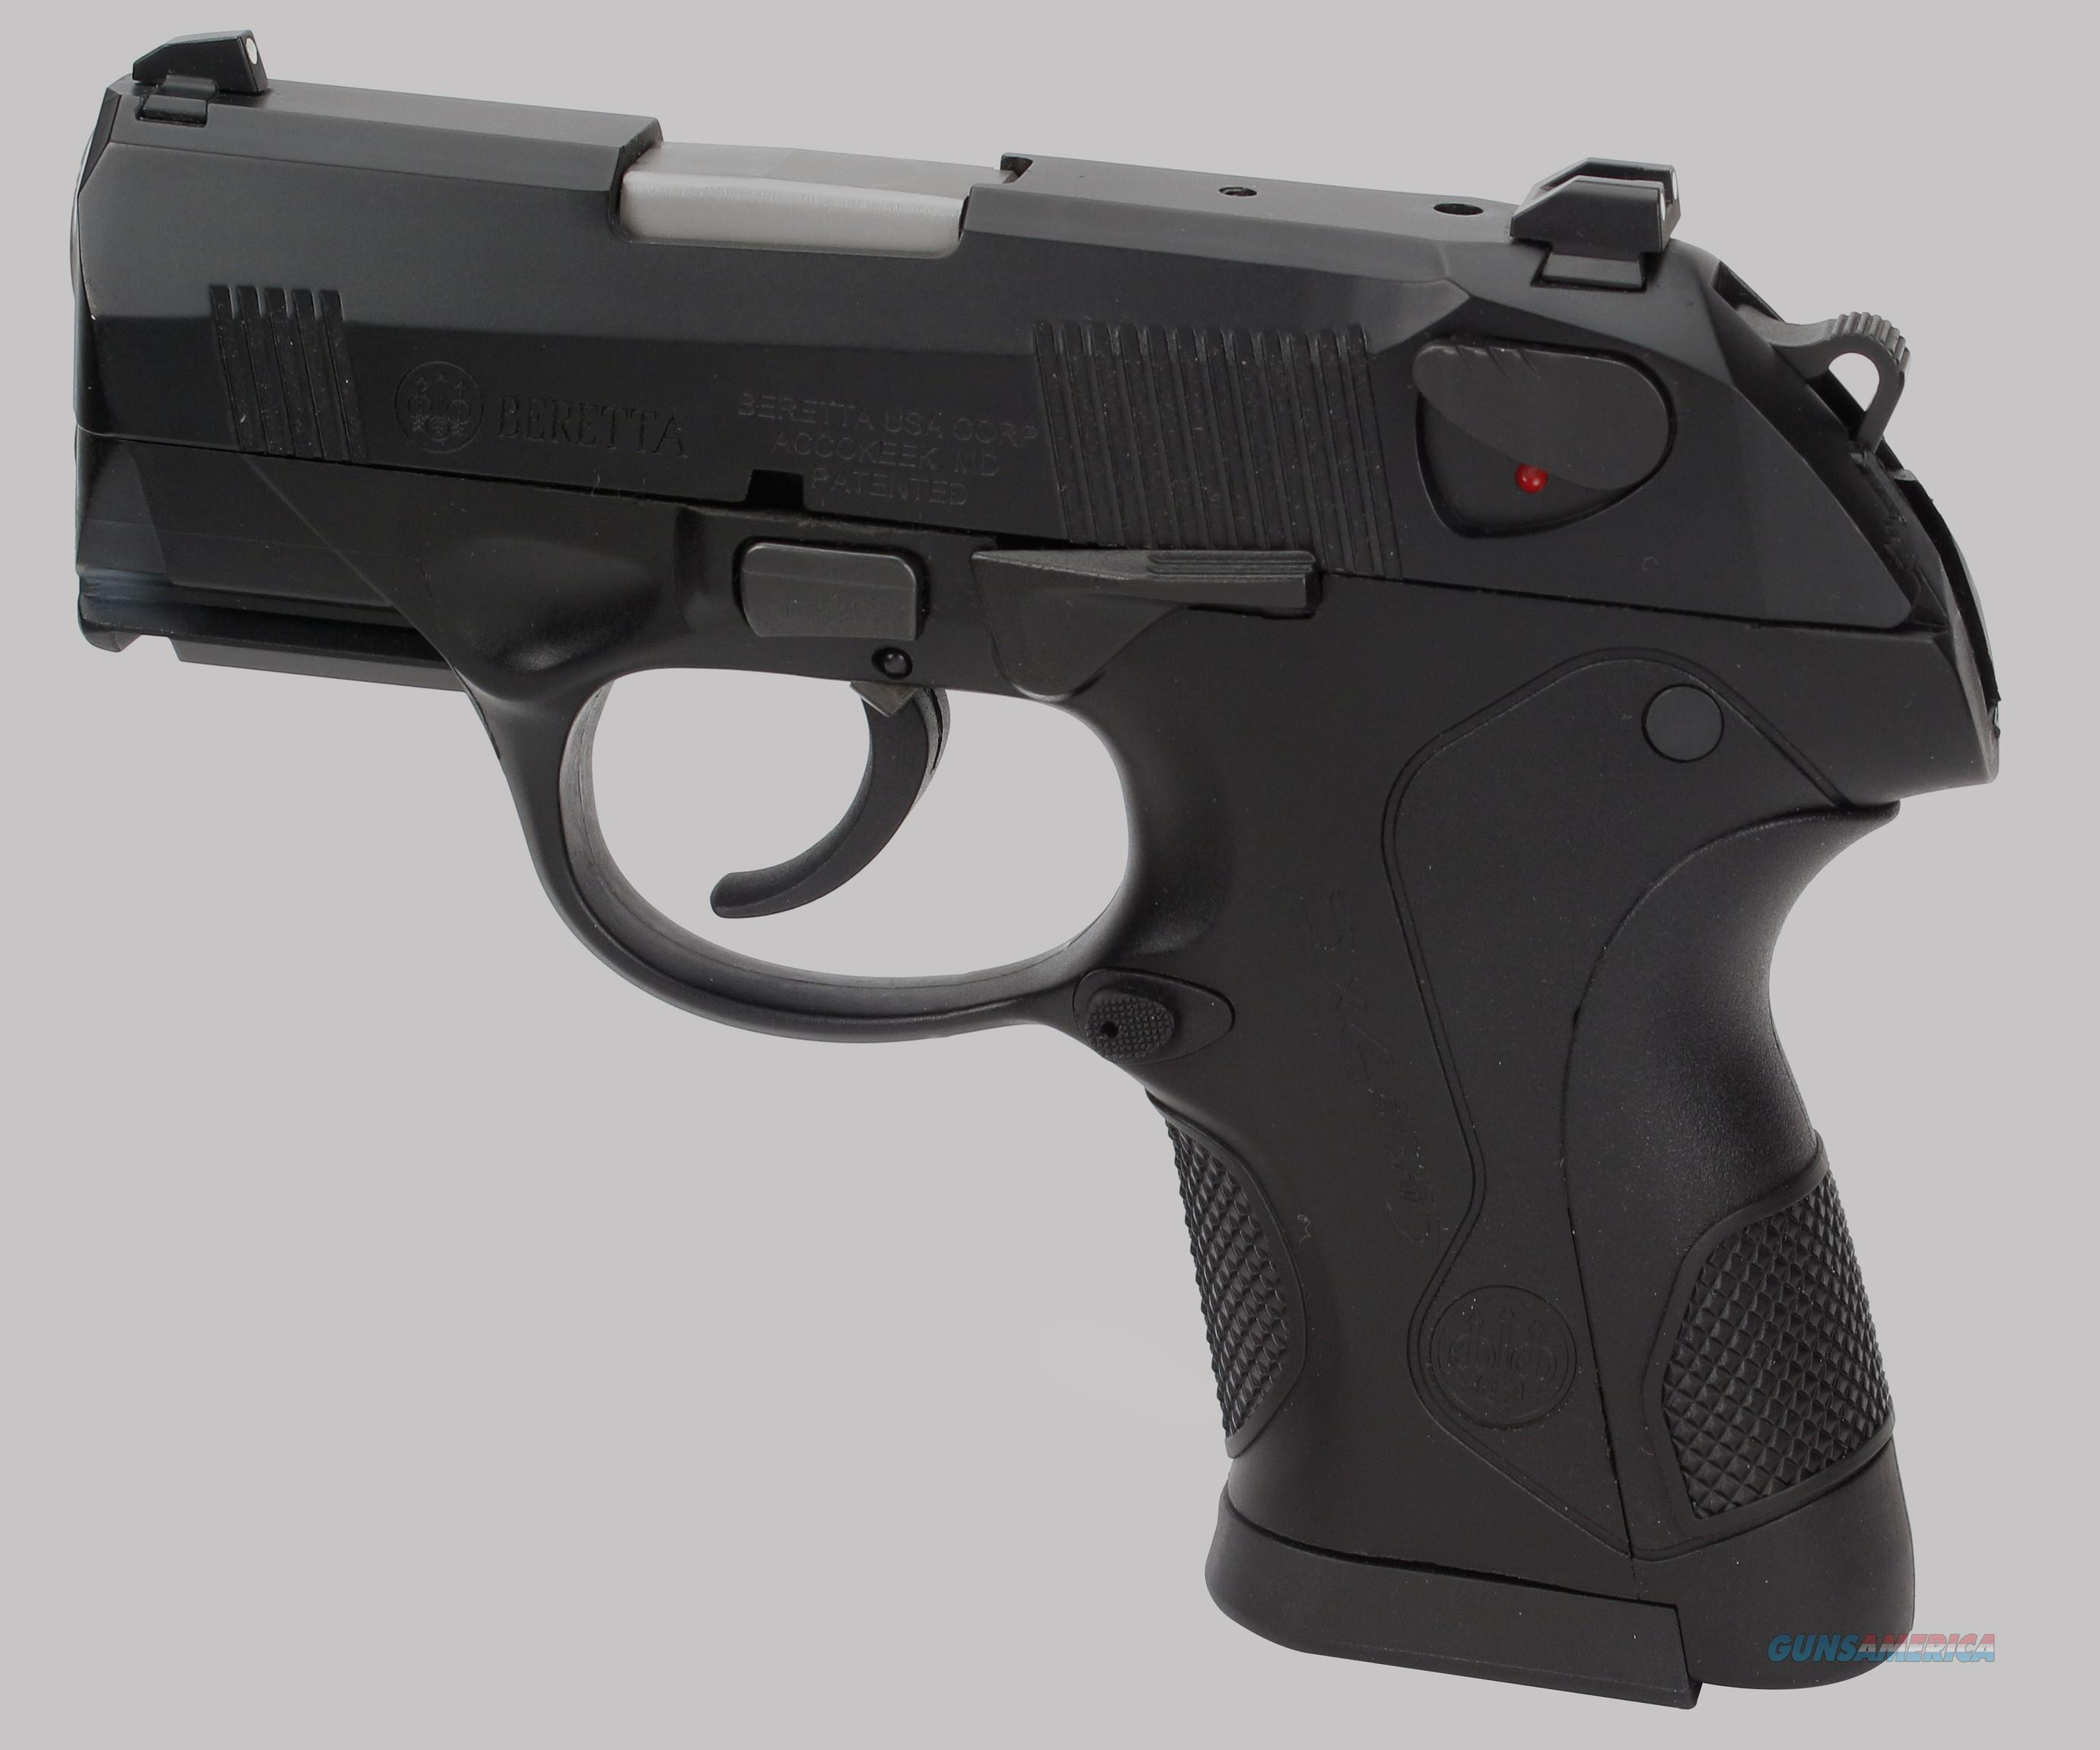 Beretta 9mm Pistol Model PX Storm for sale